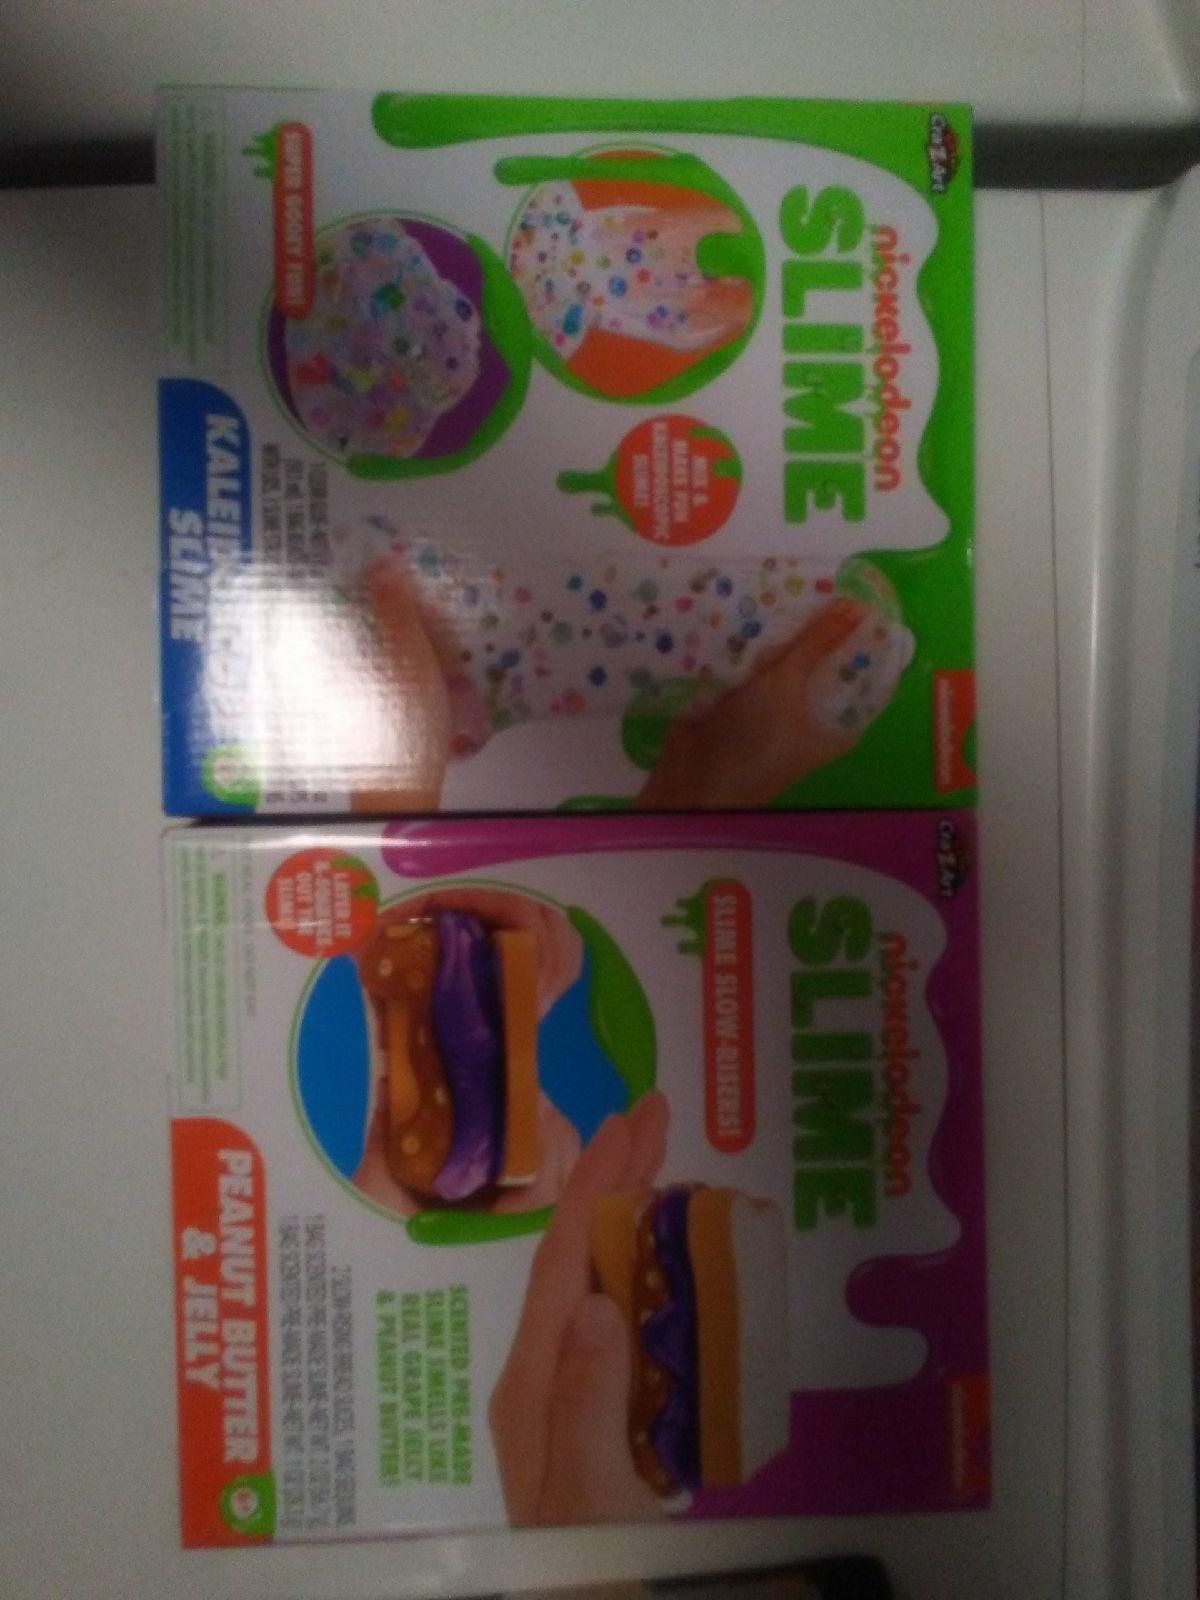 2 Brand New Nickelodeon Slime Kits